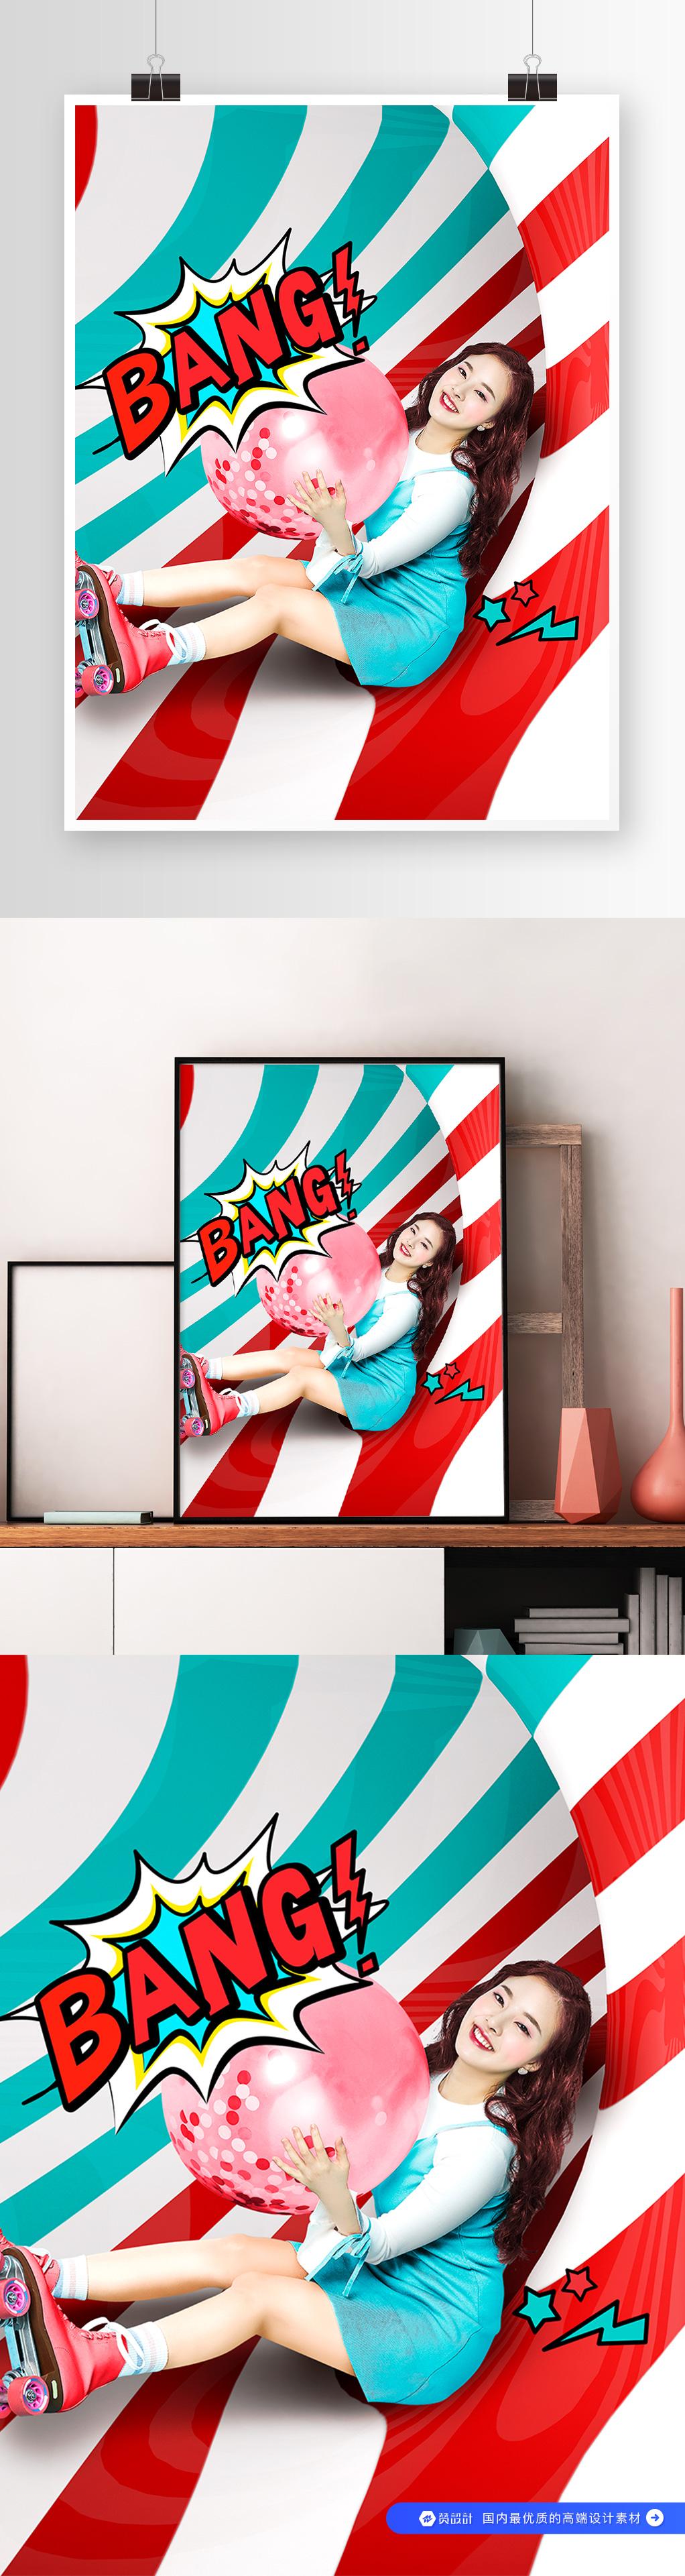 wow 彩色背景 美女合成海报 (5)